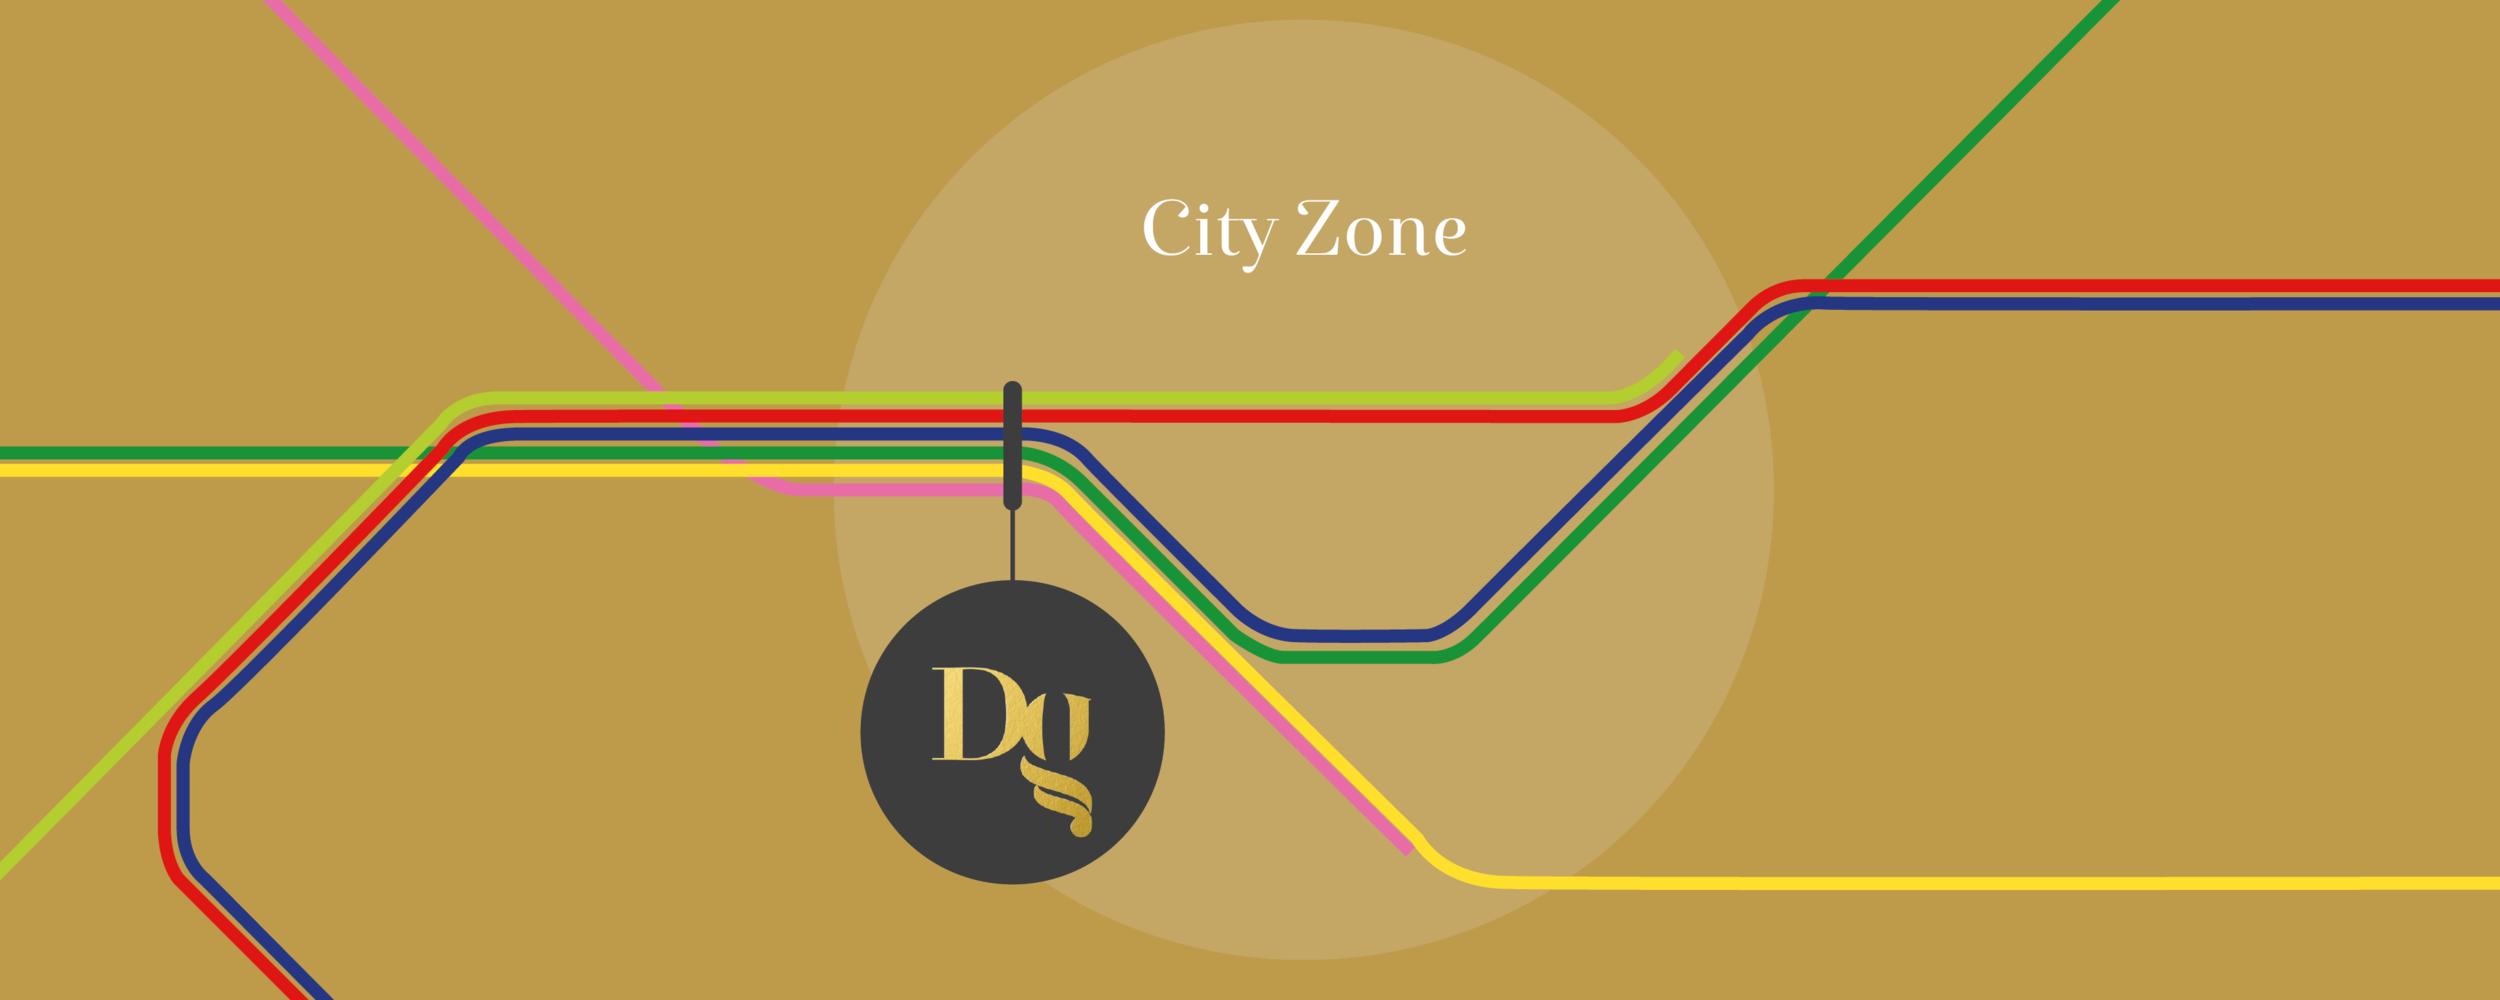 deansgate_square_metrolink_plan.png